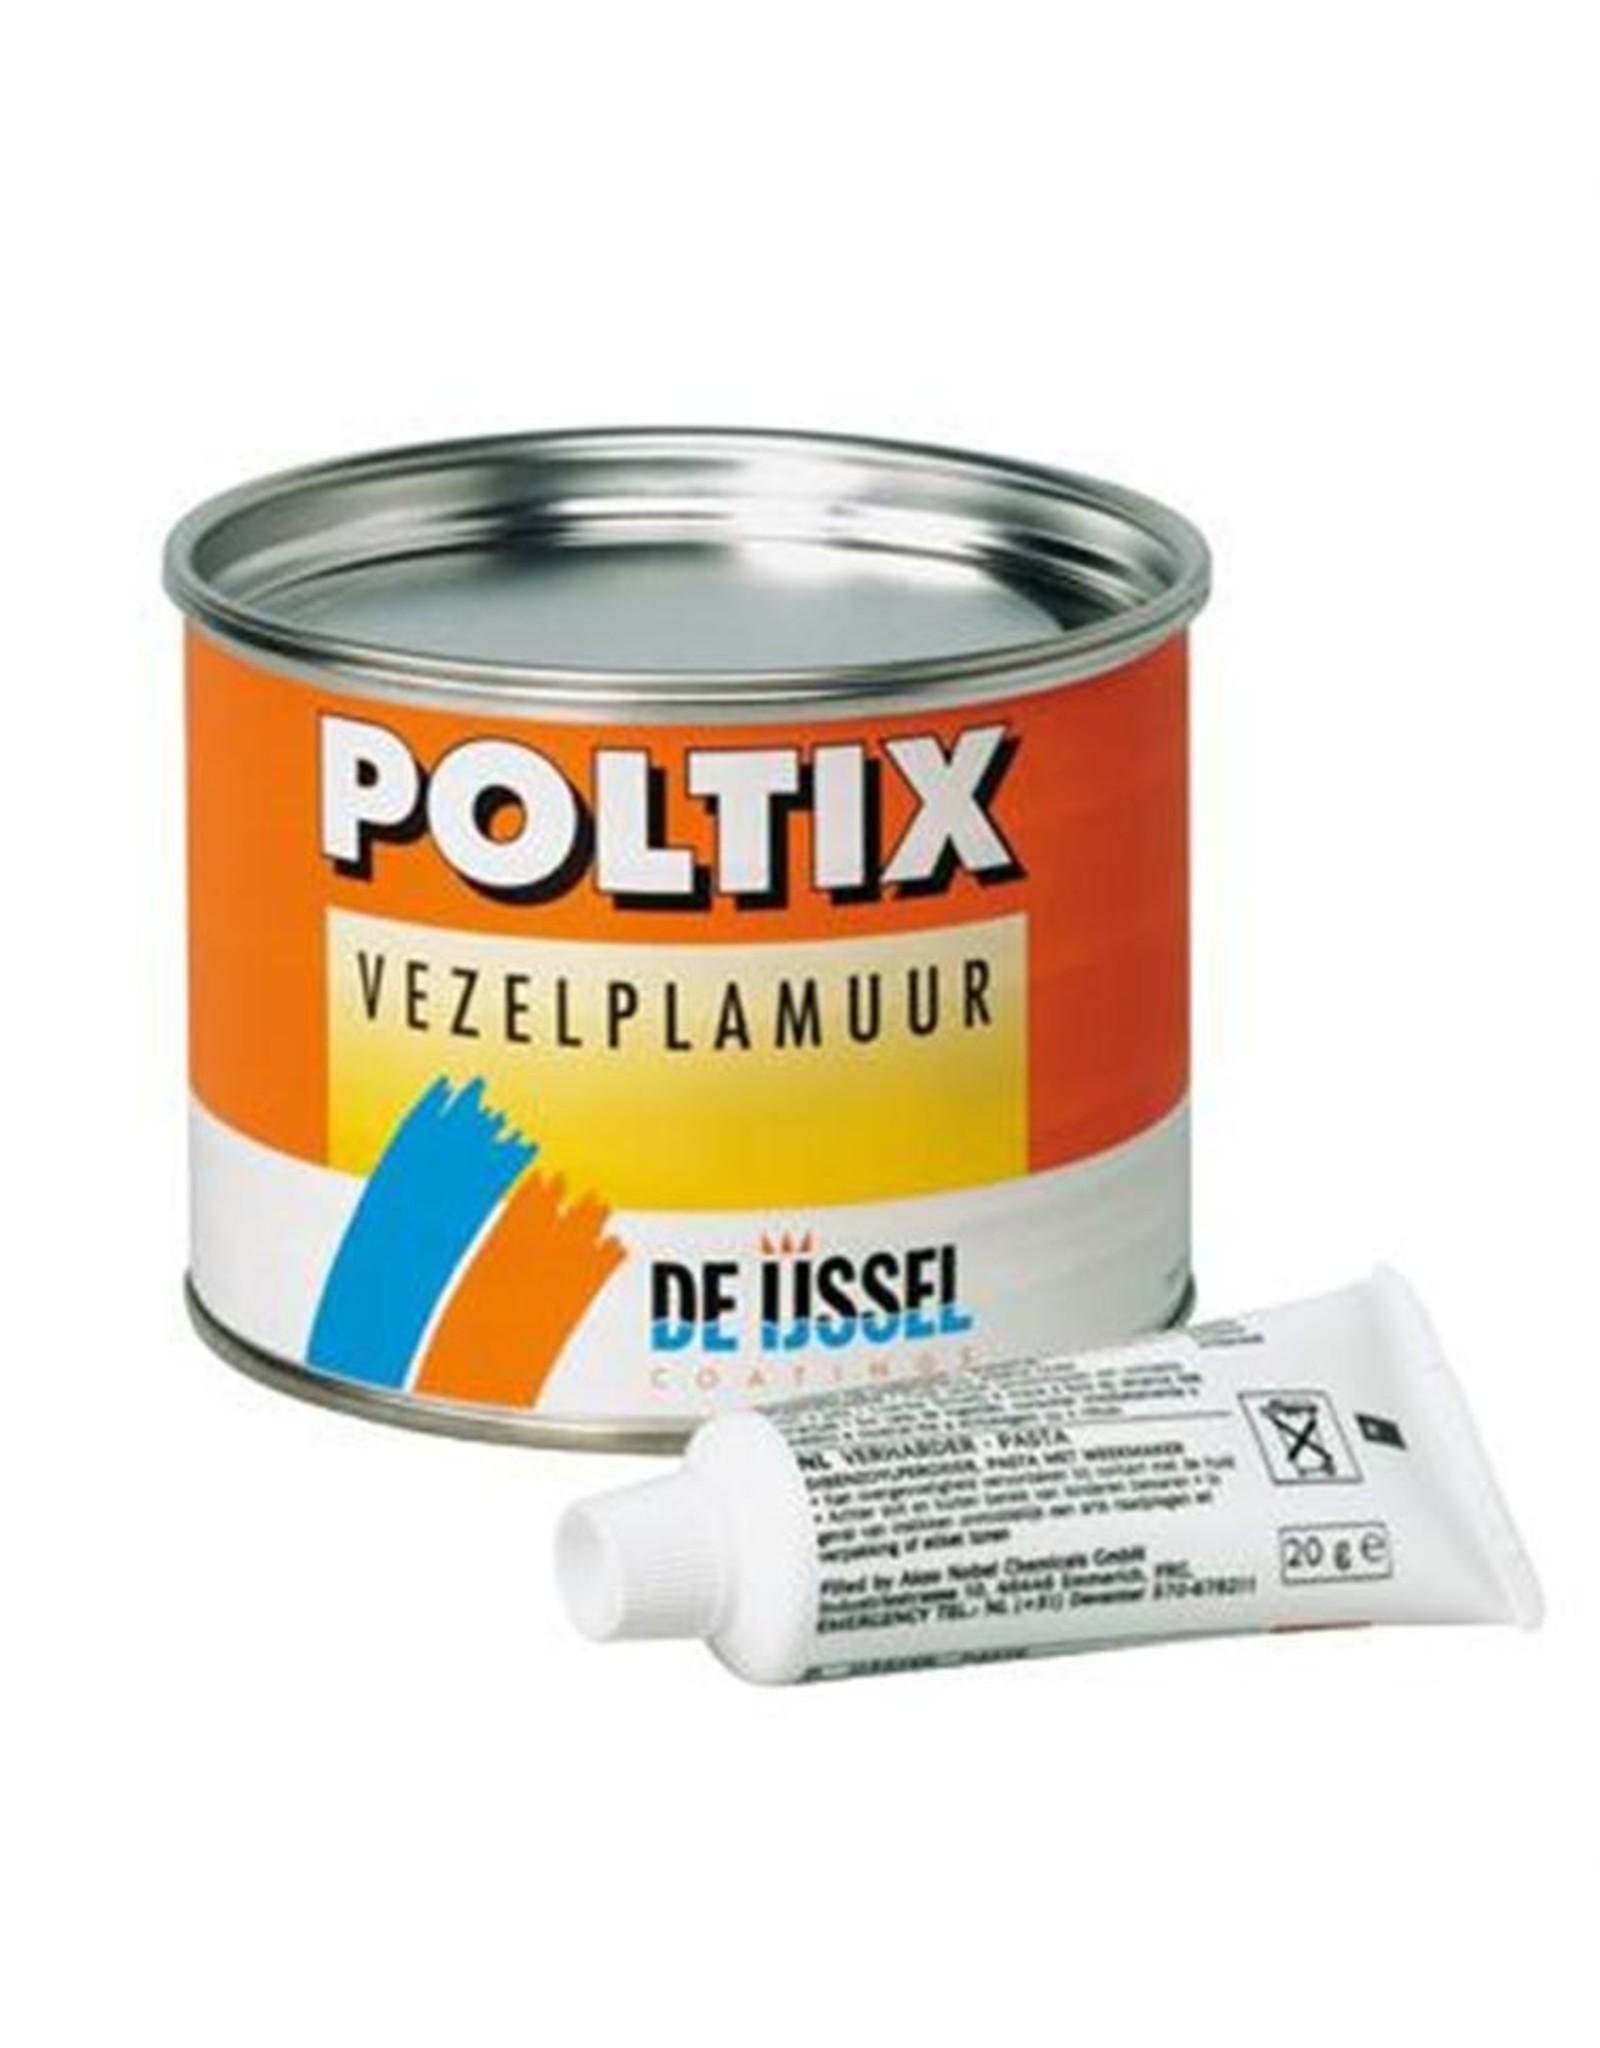 Poltix Vezelplamuur 500 Gram